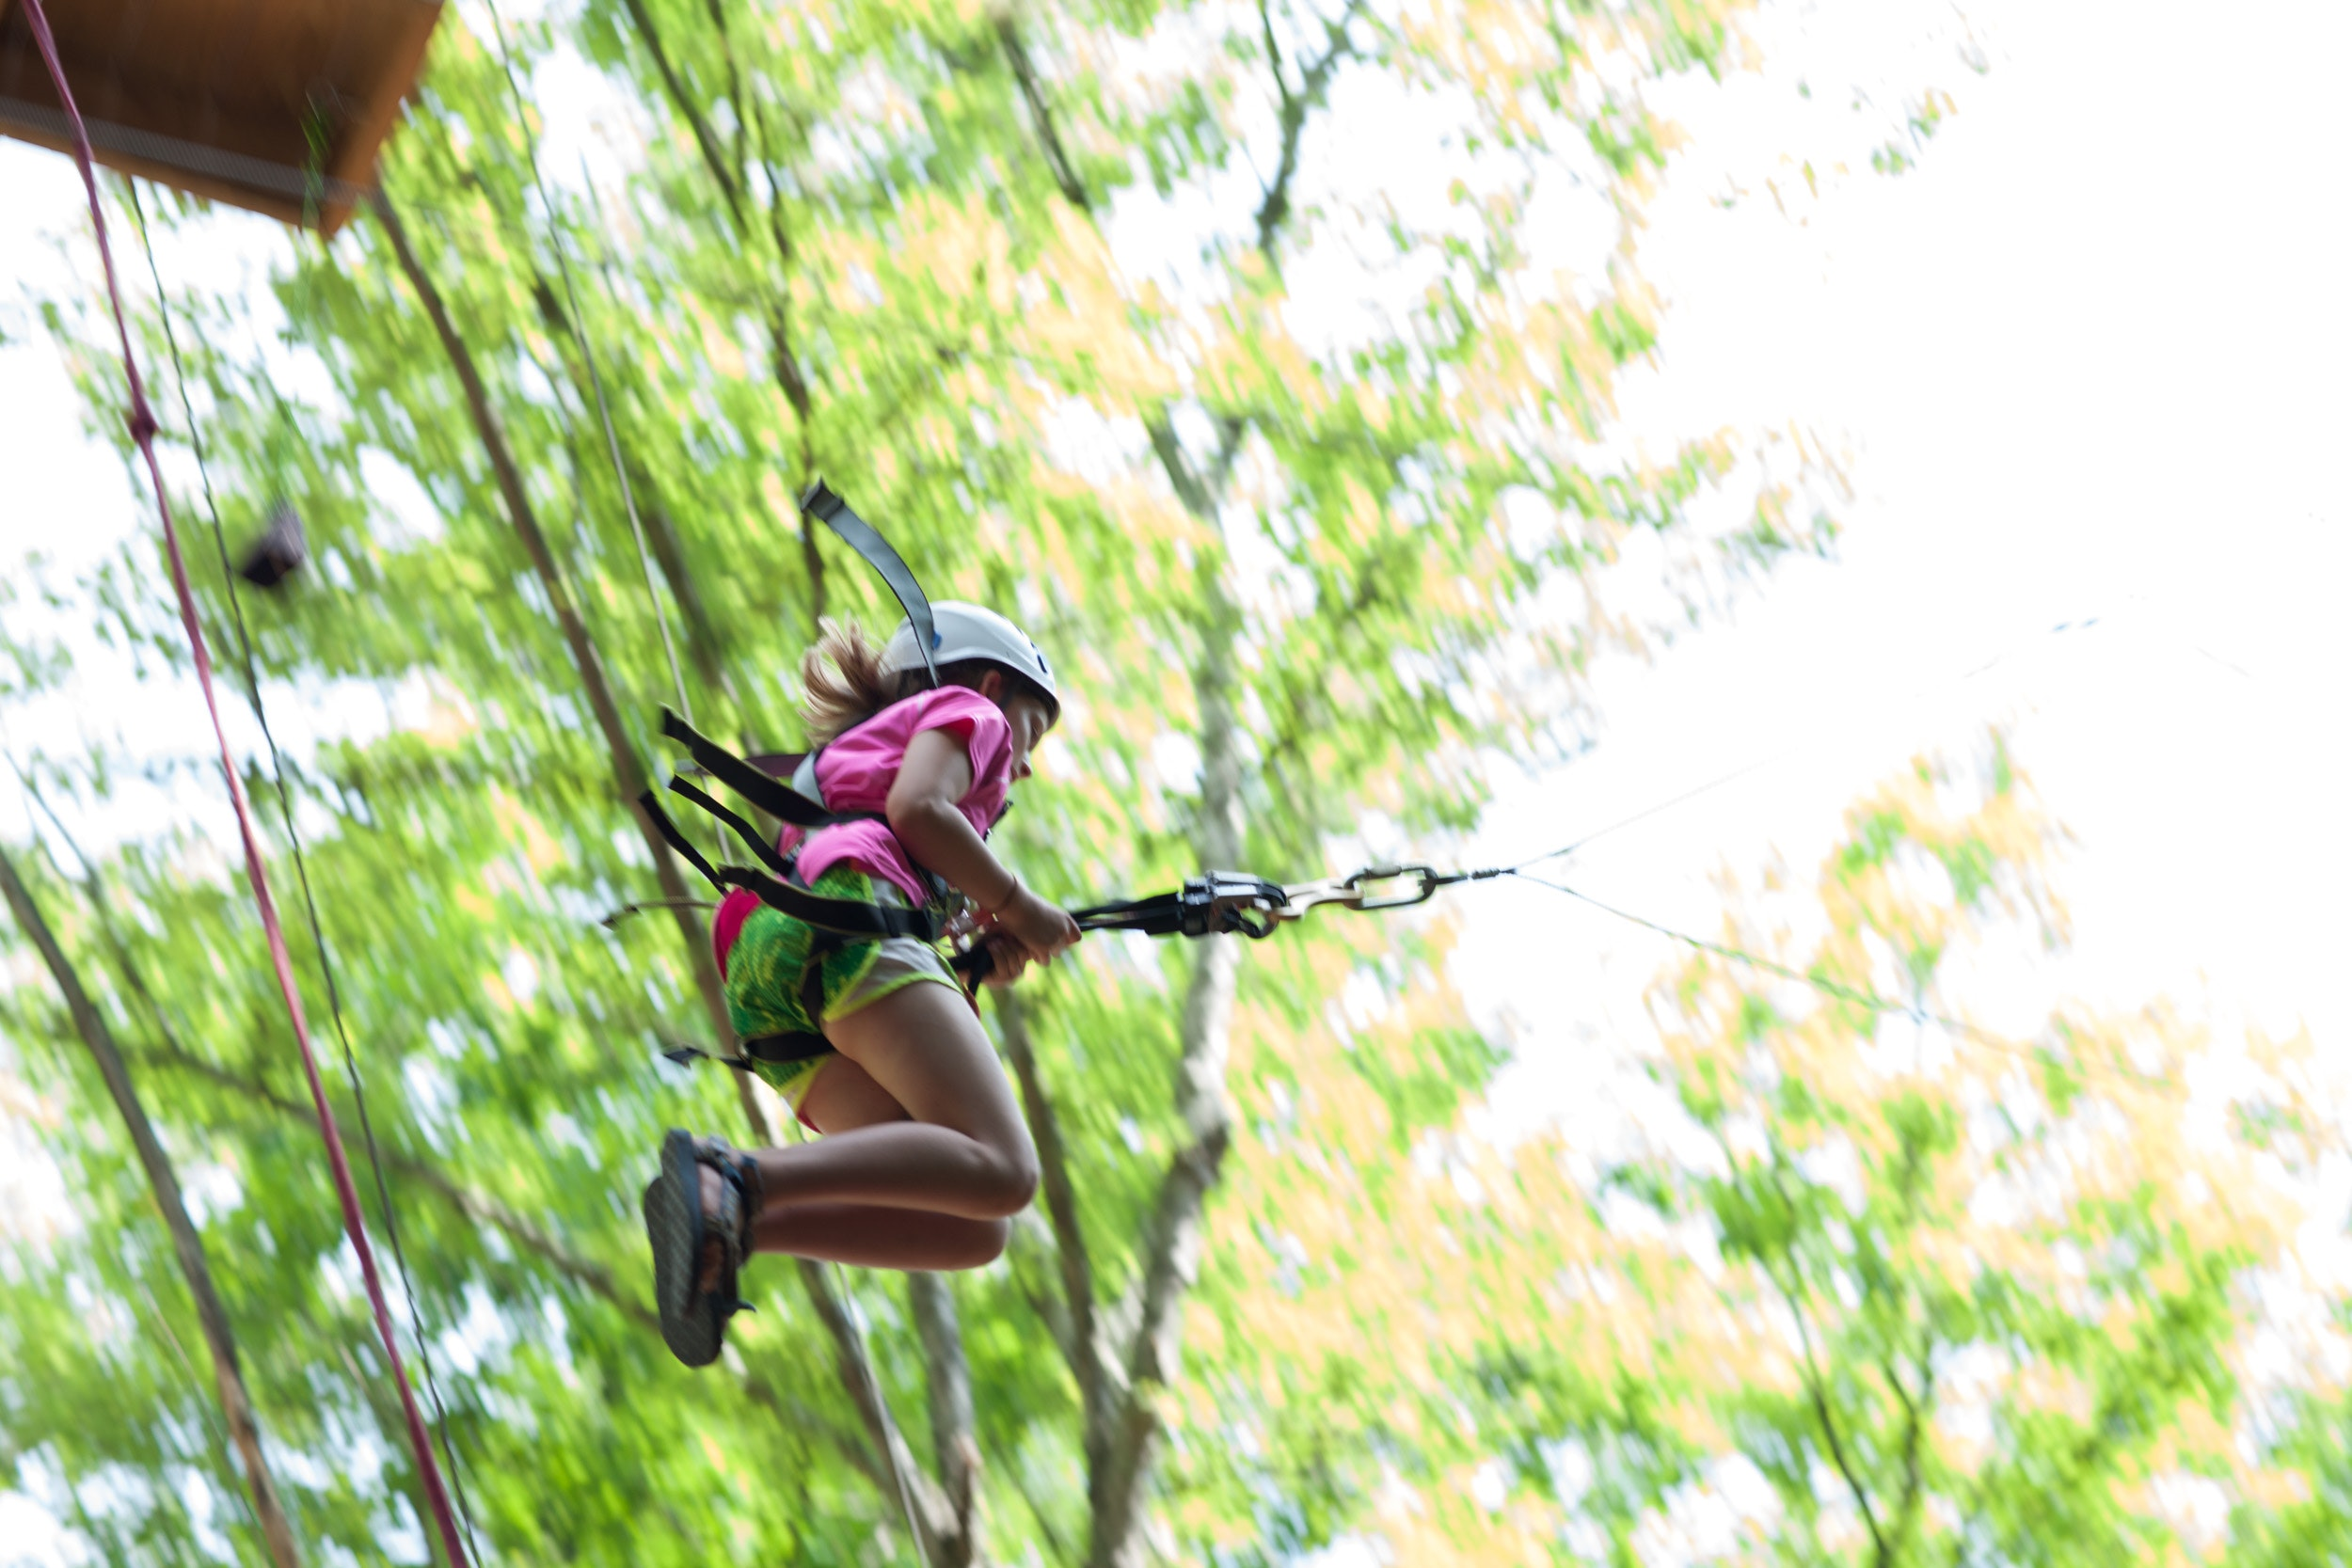 Courage at highlander summer camp for boys and girls in north carollina.jpg?ixlib=rails 2.1